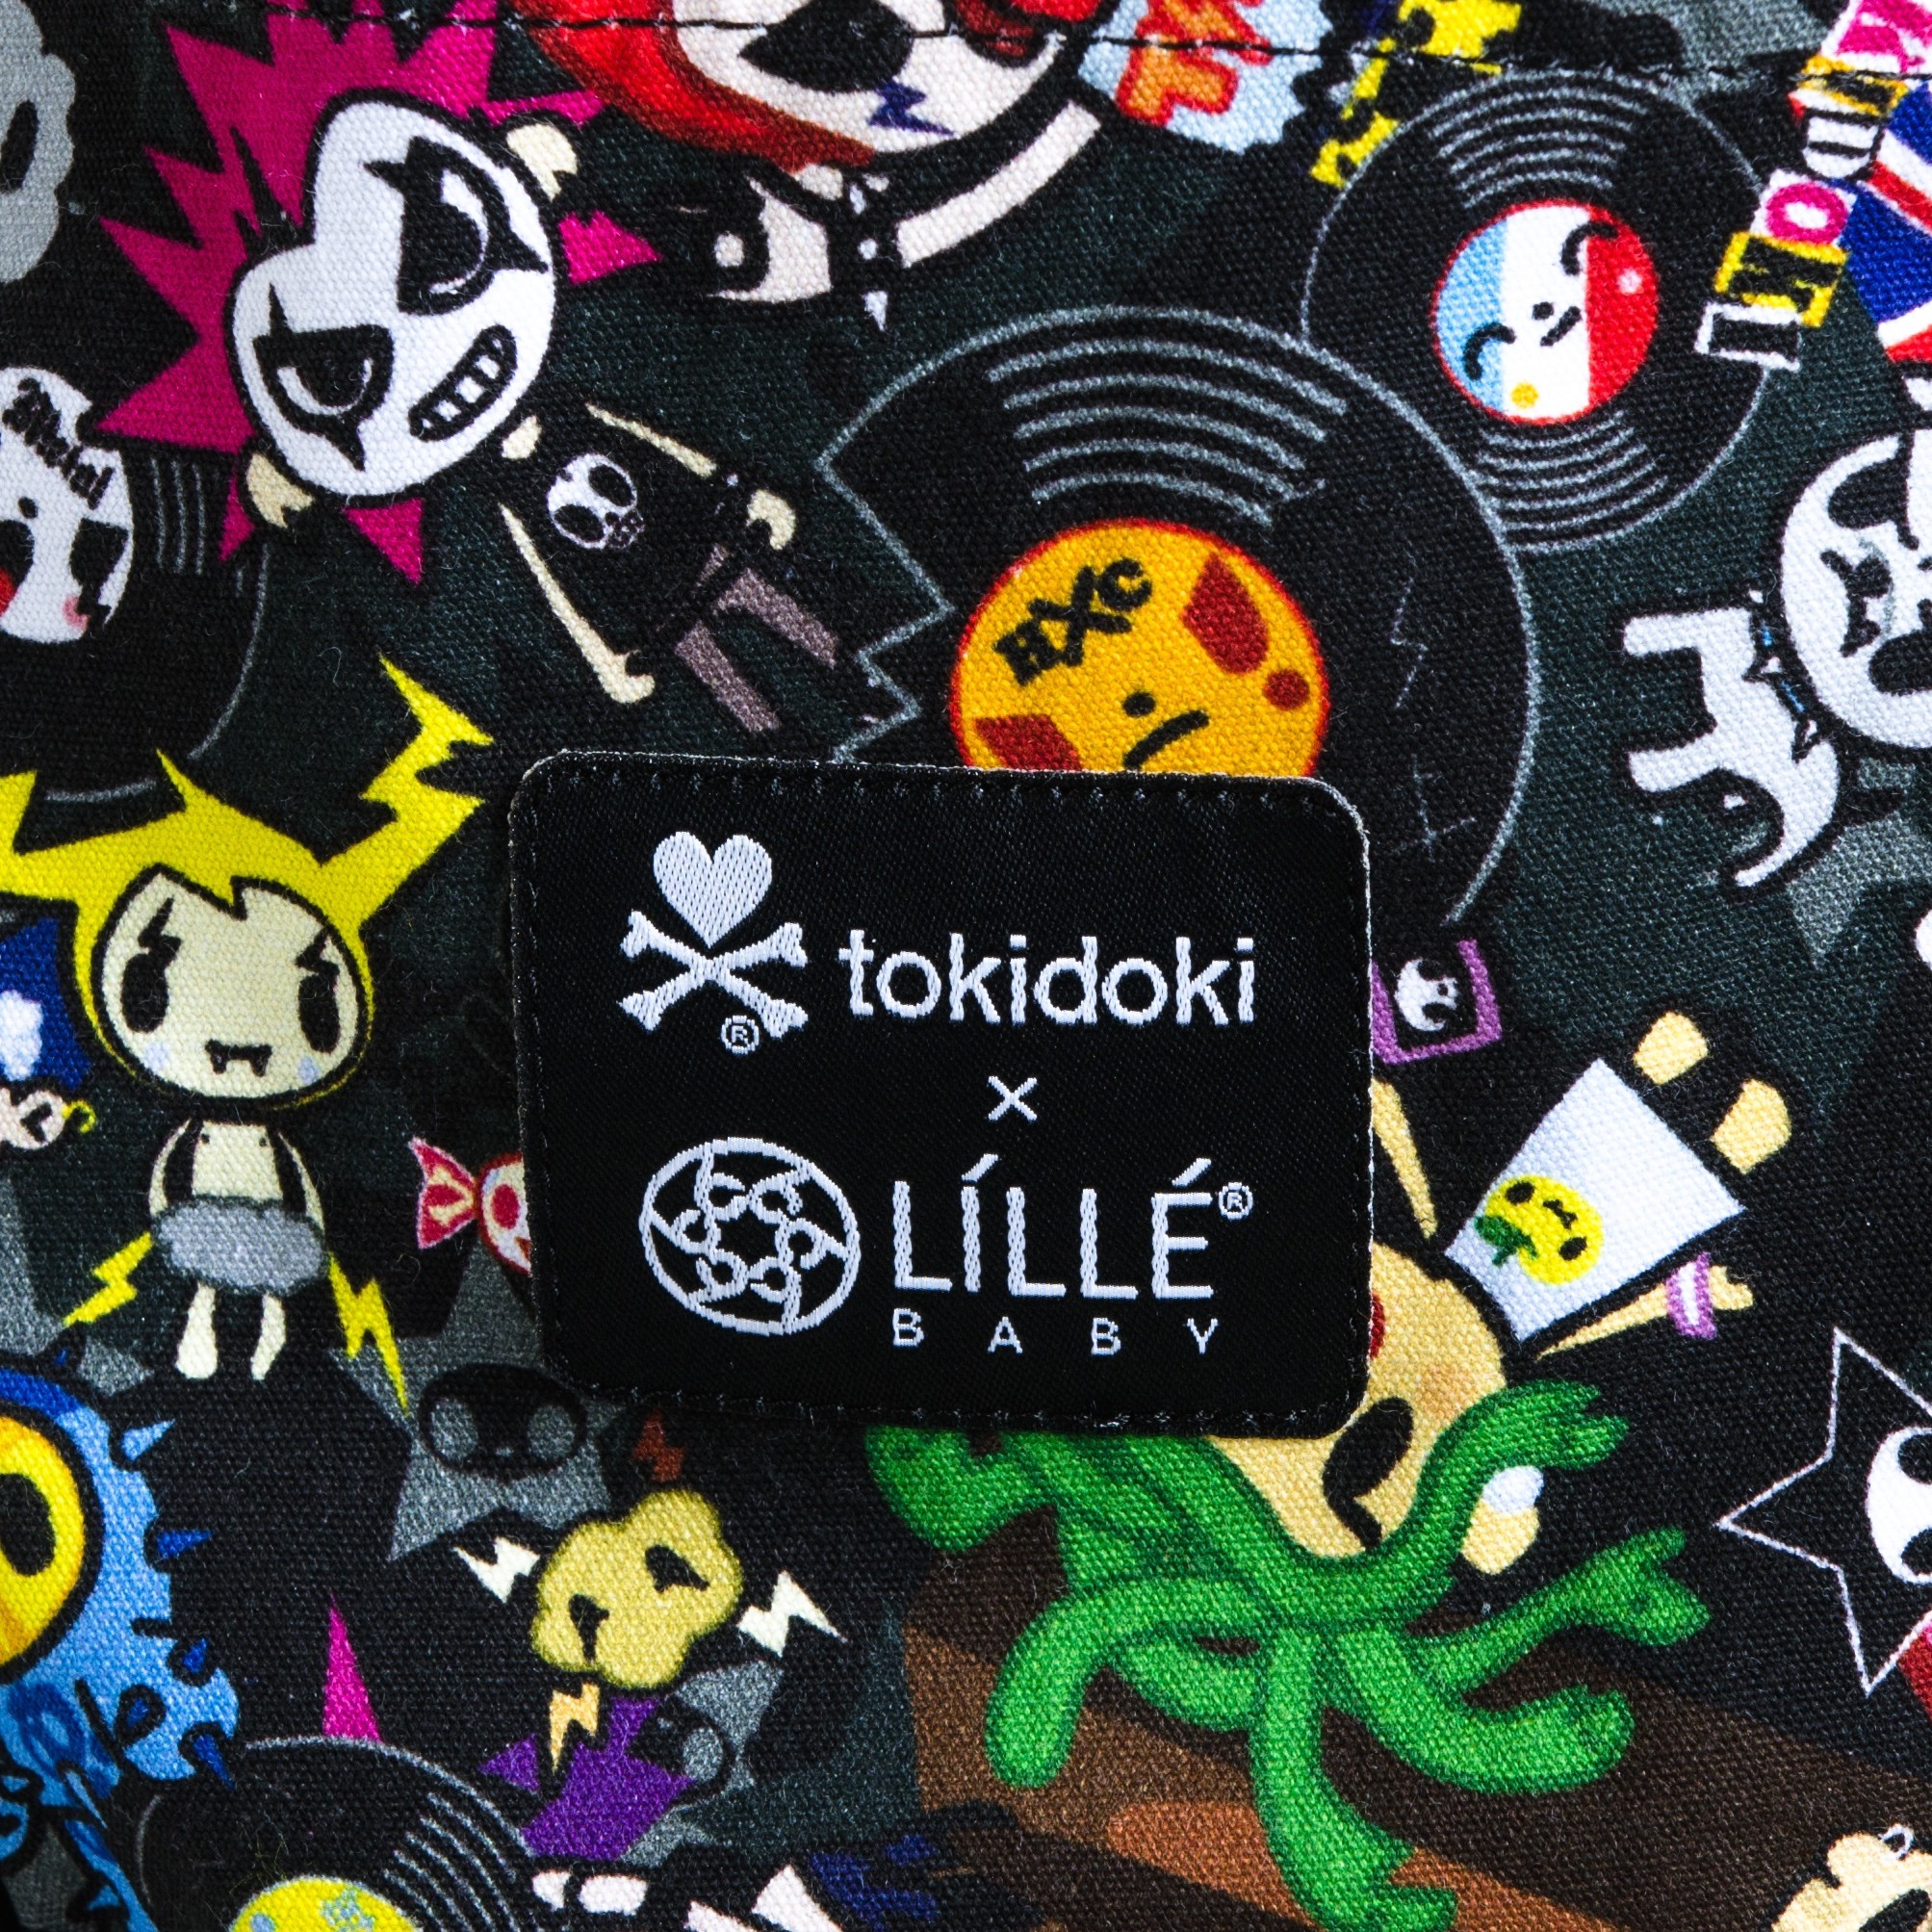 aae5731cfa1 Lille Baby All seasons - Tokidoki x - Cheeky Cherubs - Cloth Nappies ...